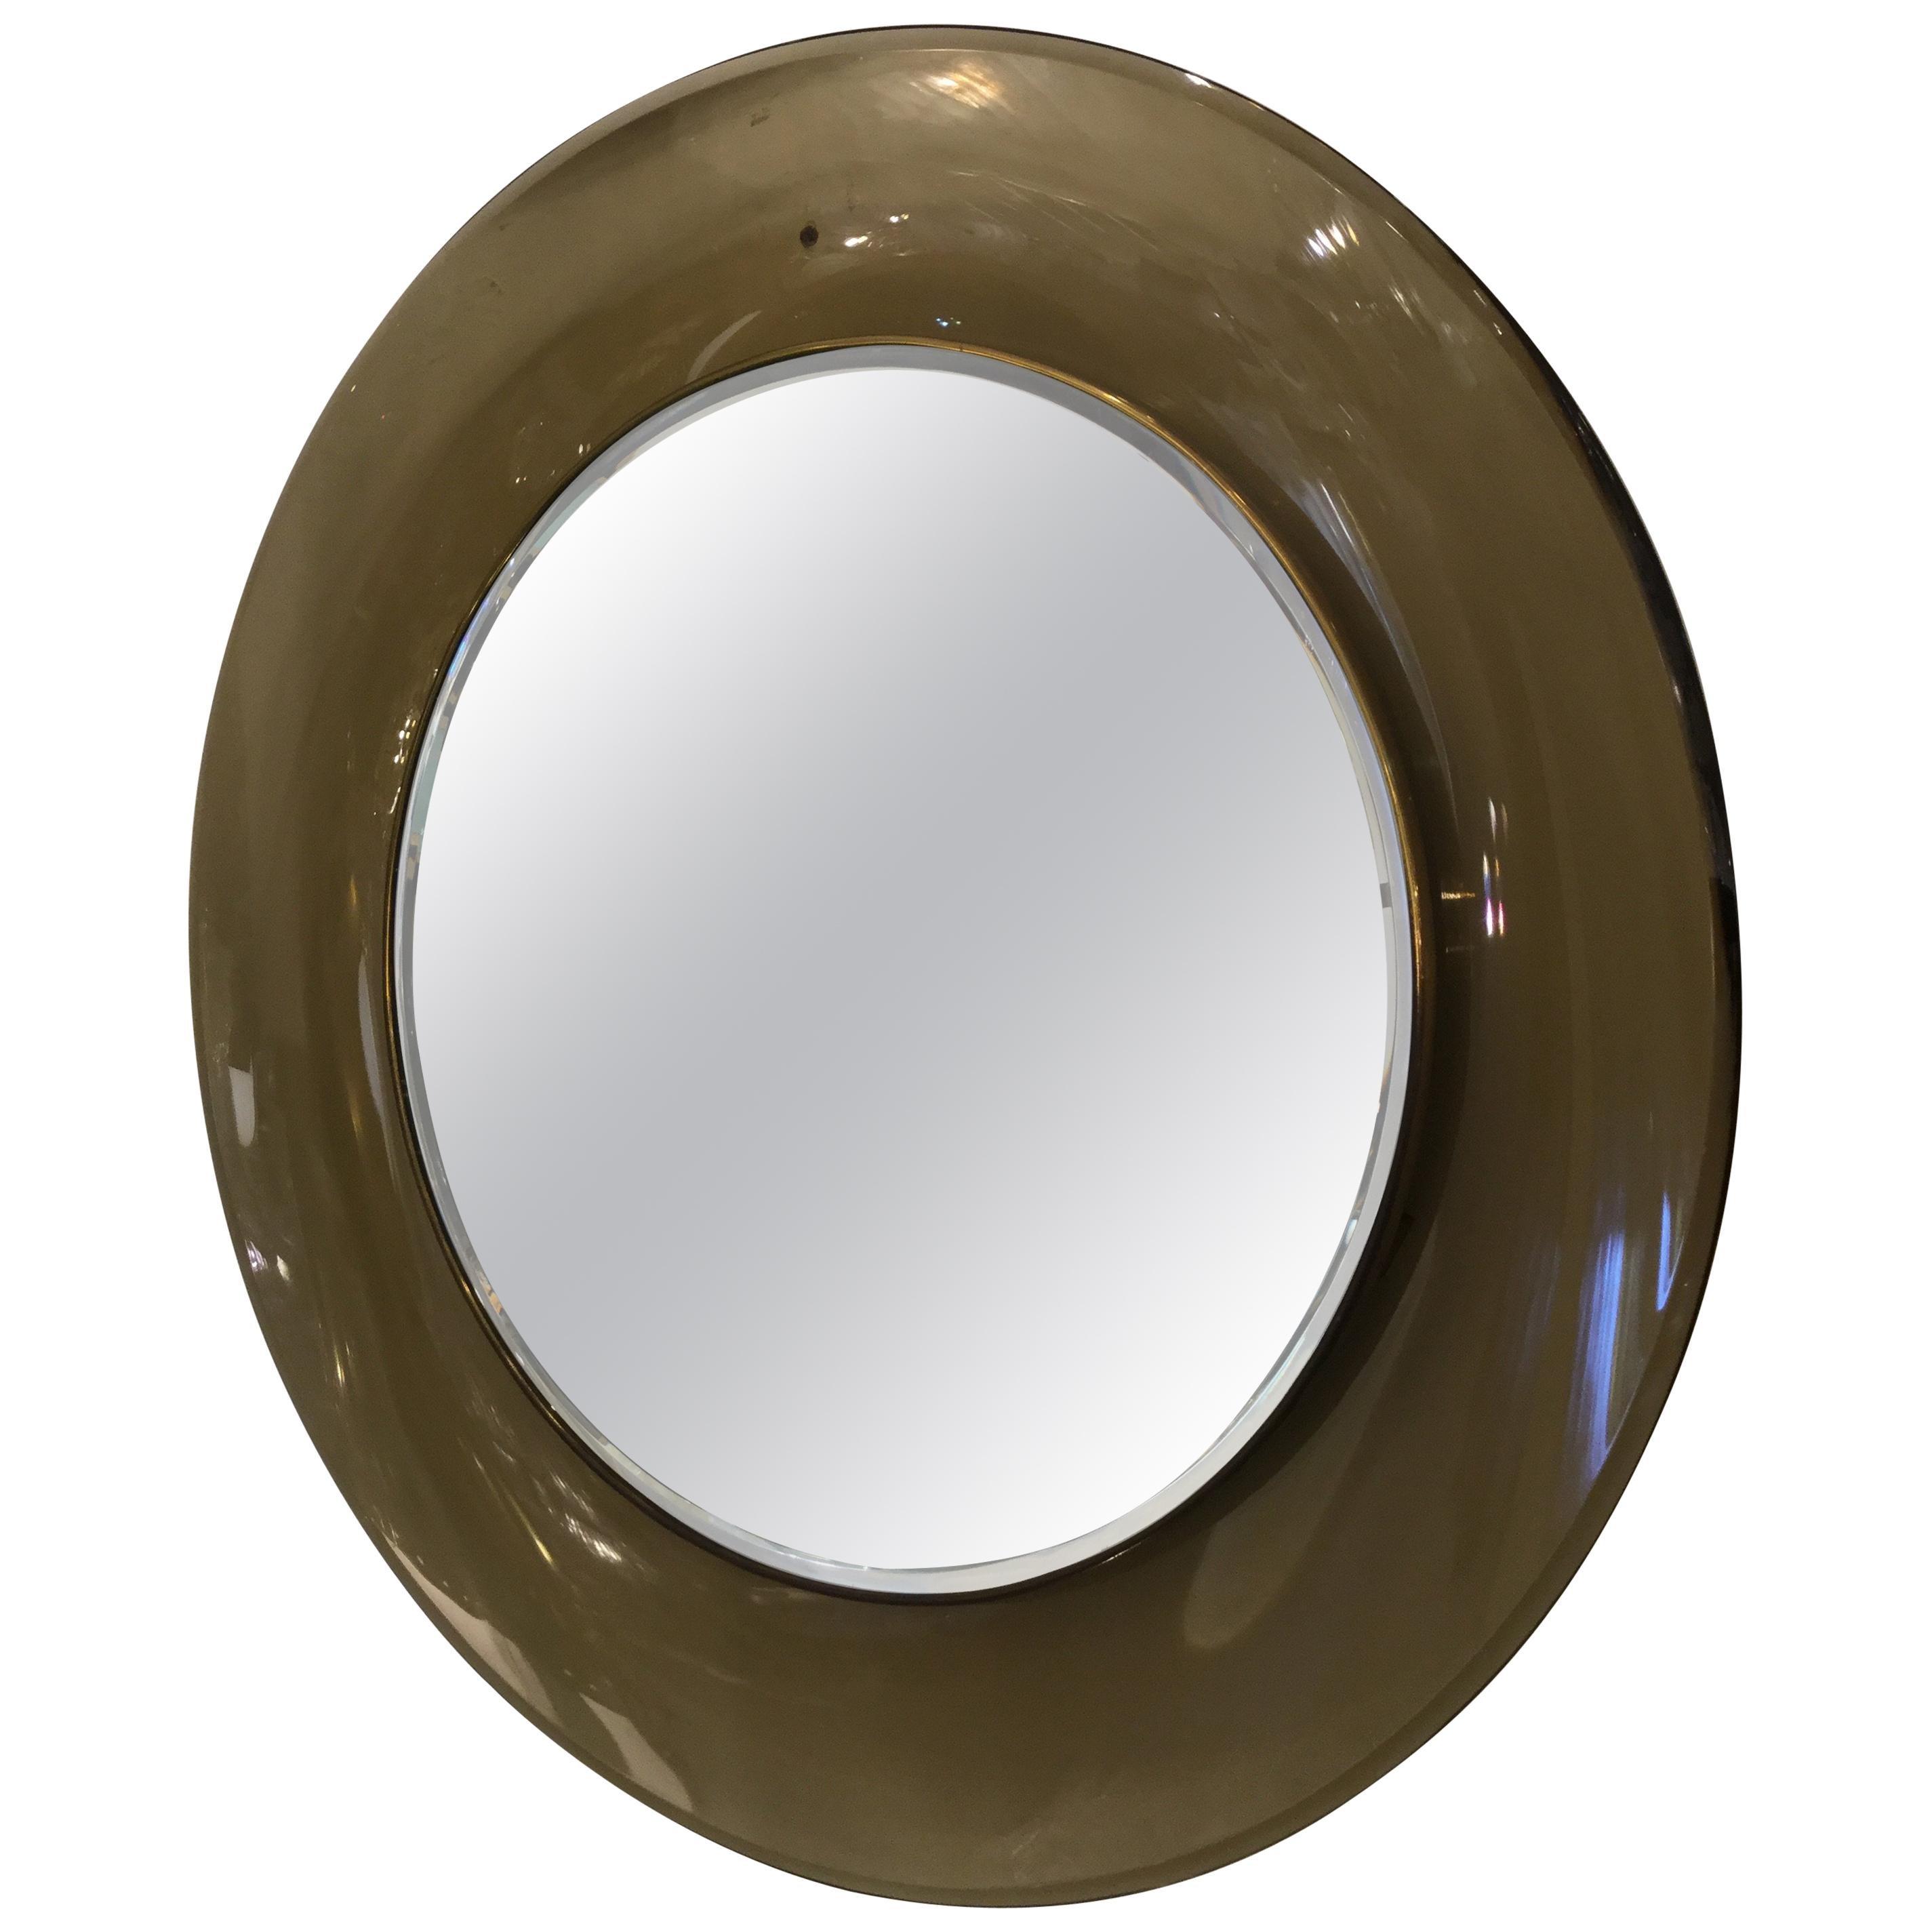 Italian Rare Mirror by Max Ingrand for Fontana Arte, Model 1699